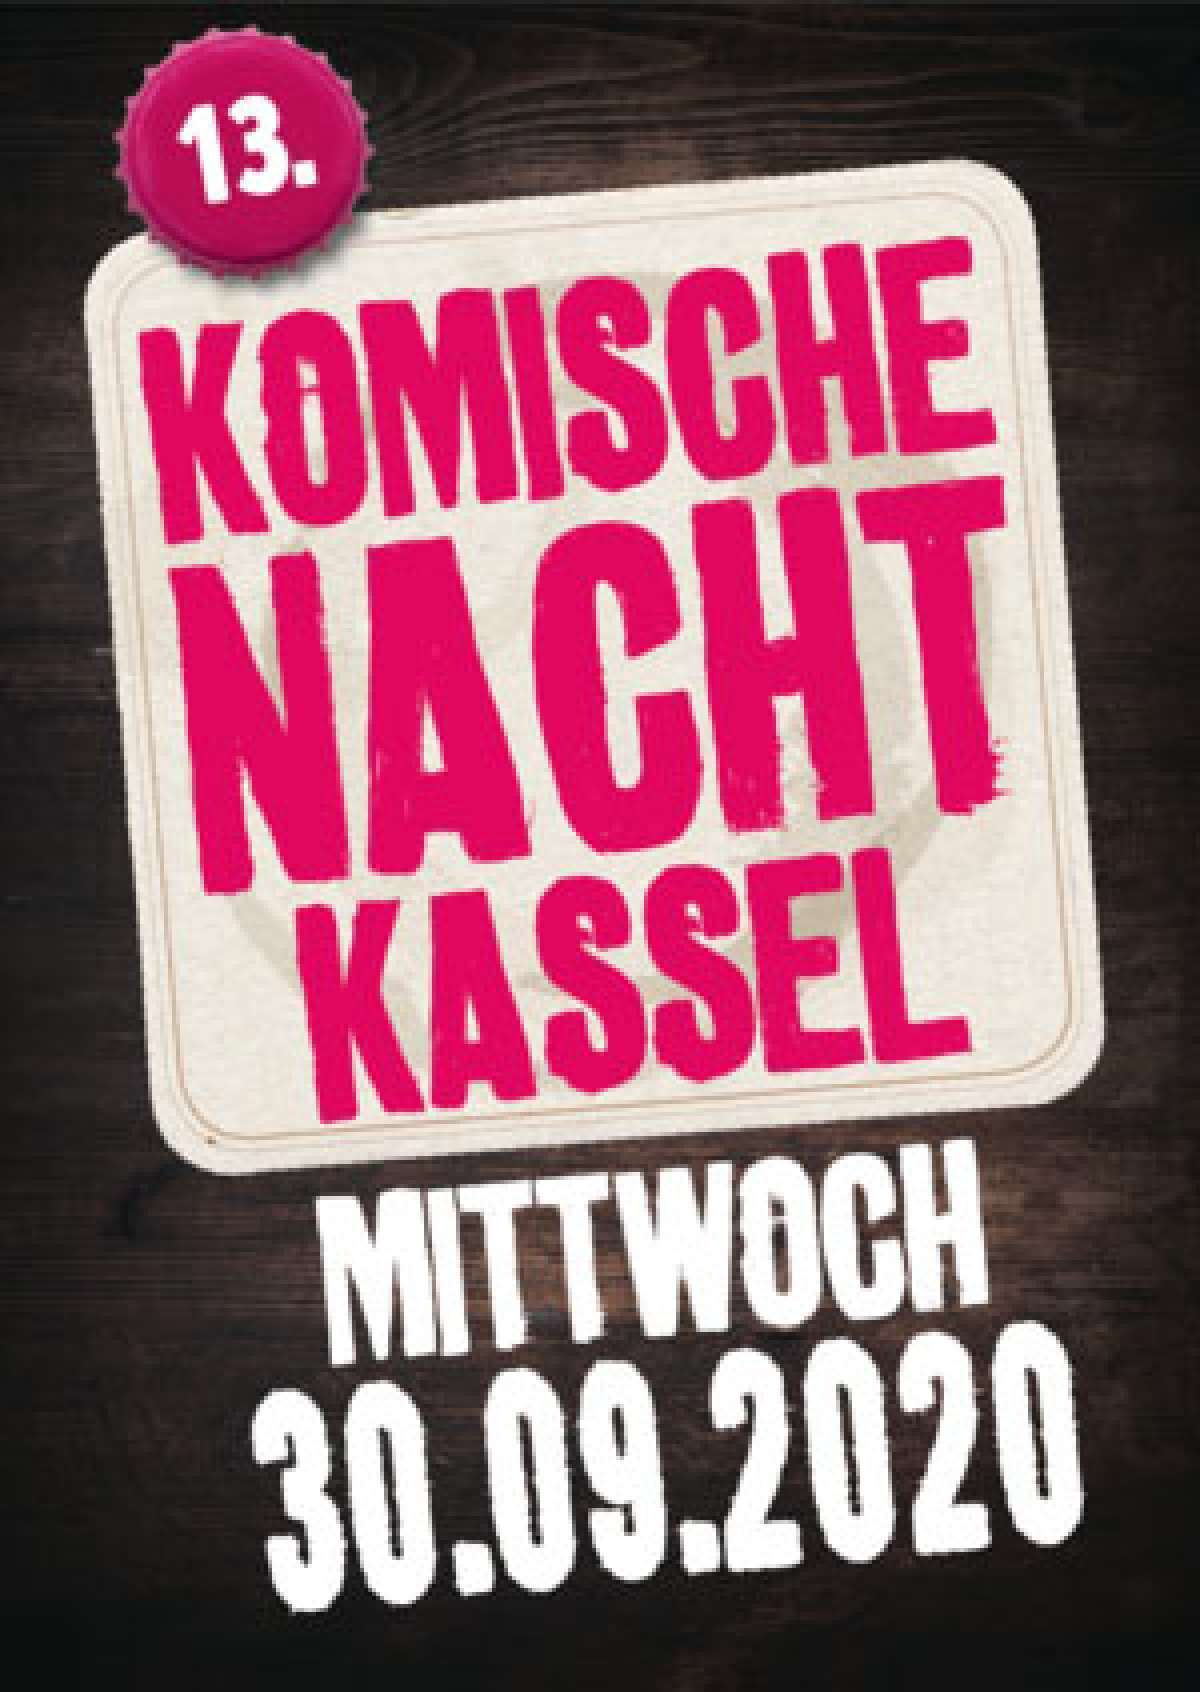 Komische Nacht - Comedy-Marathon - Diverse - Detail-Infos folgen - Hotel am Bergpark - Kassel